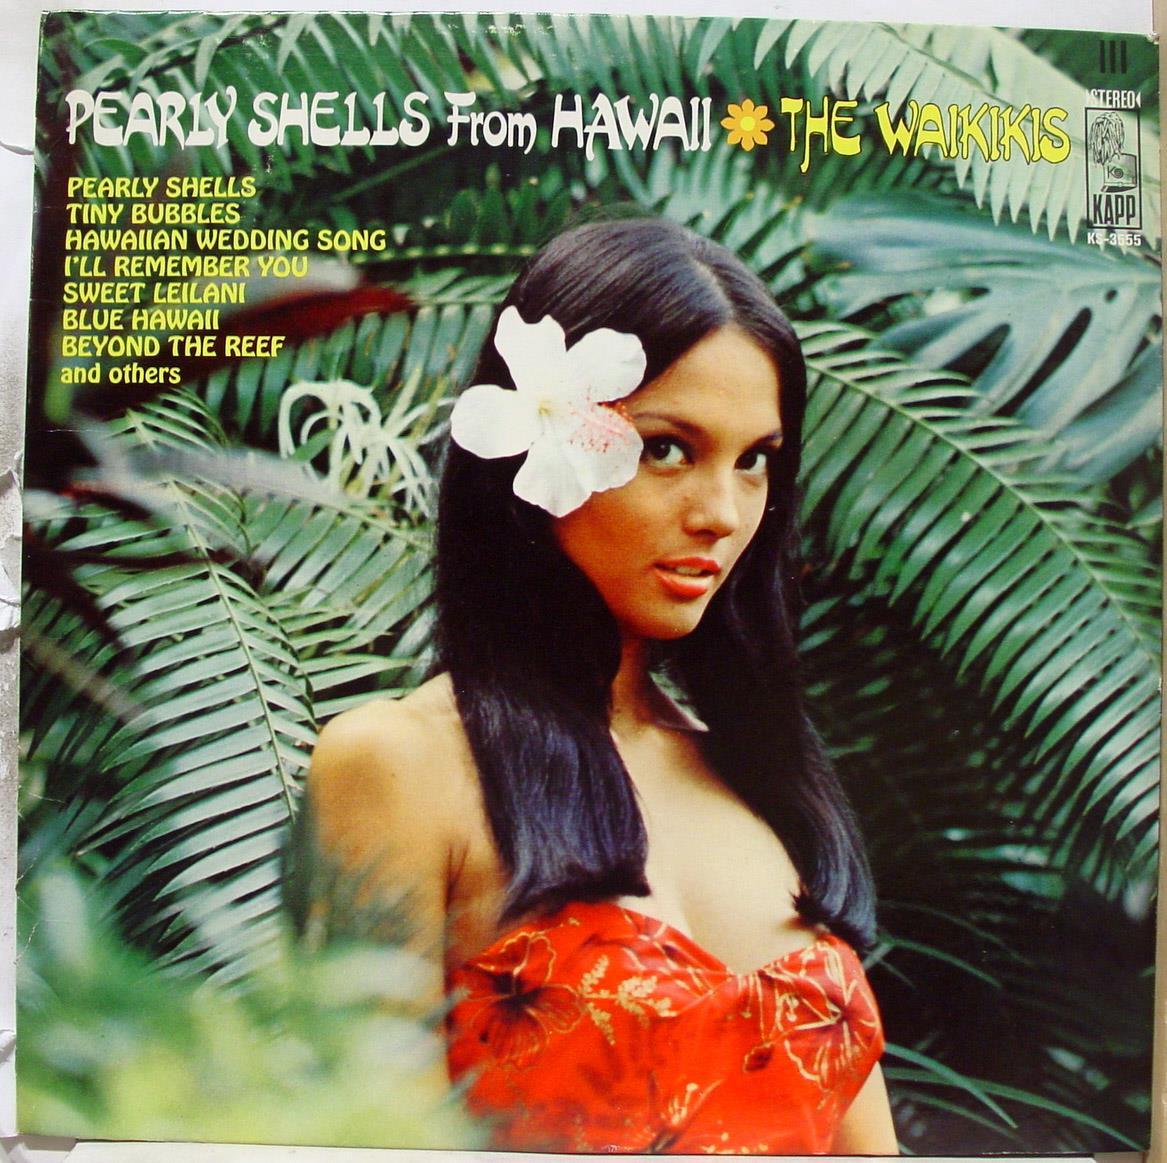 WAIKIKIS - The Waikikis Pearly Shells From Hawaii Lp Mint- Ks 3555 Stereo Usa 1968 Record (pearly Shells From H